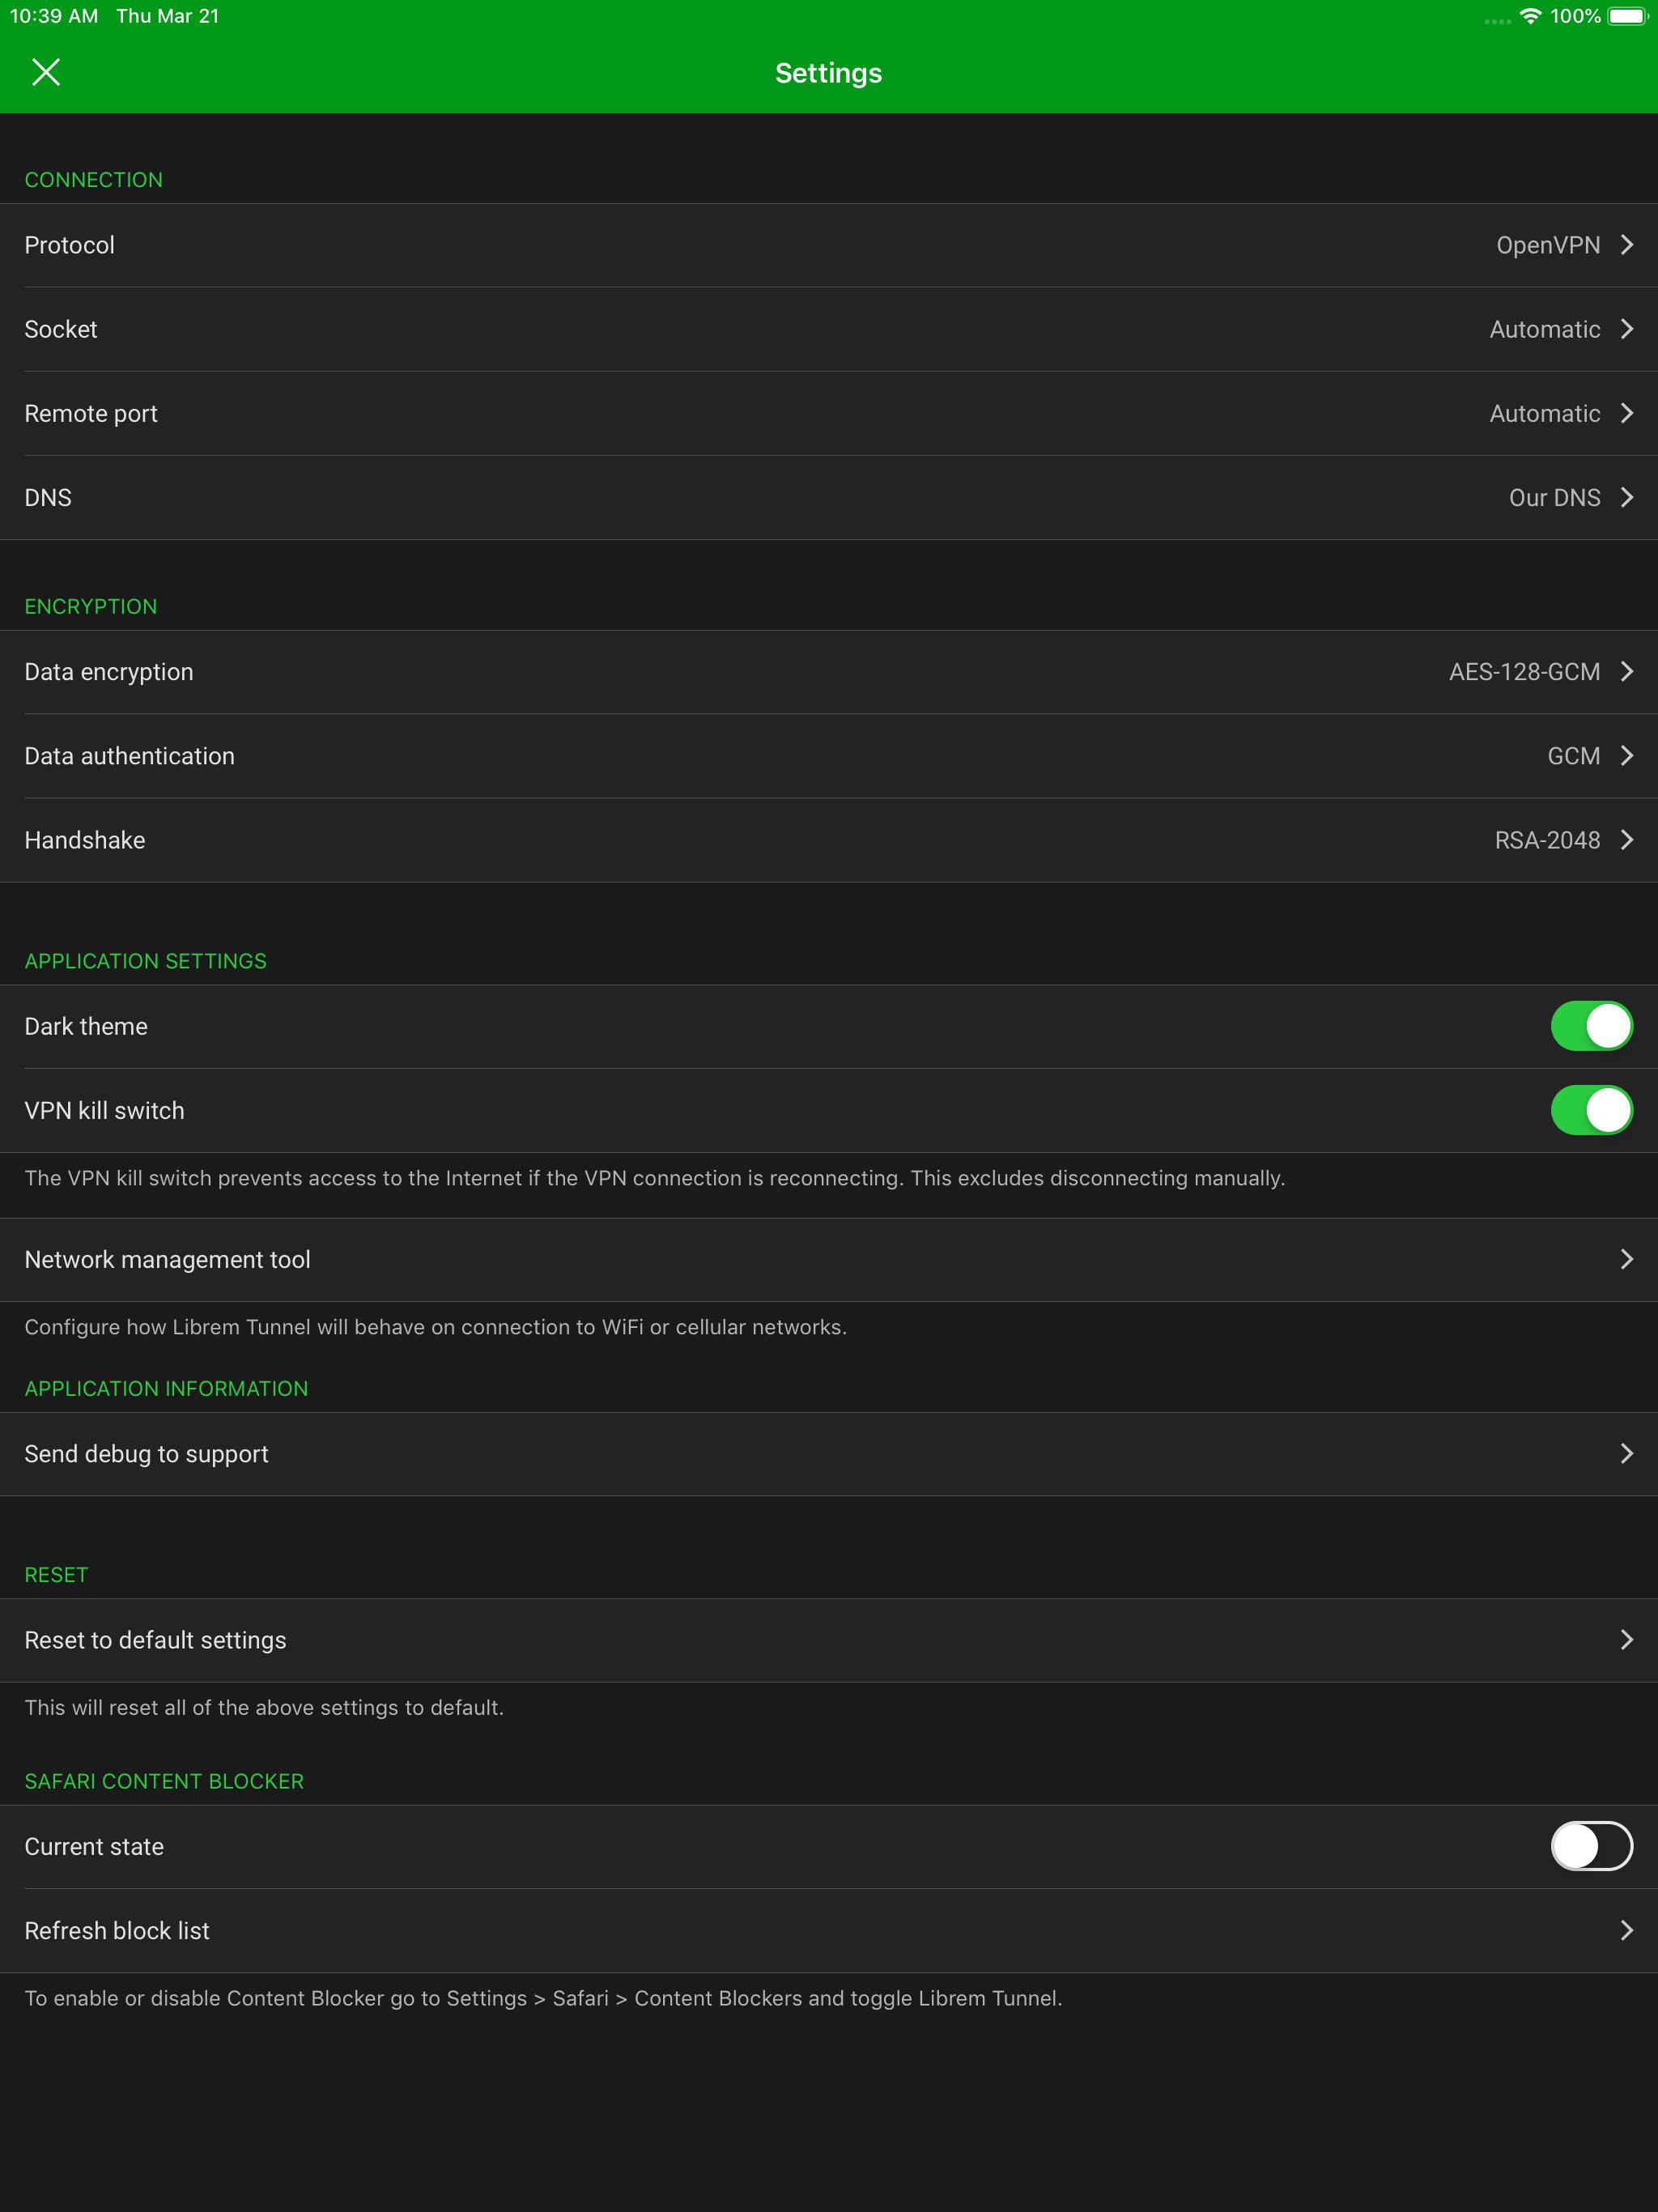 fastlane/screenshots/en-US/12_settings-iPad.png